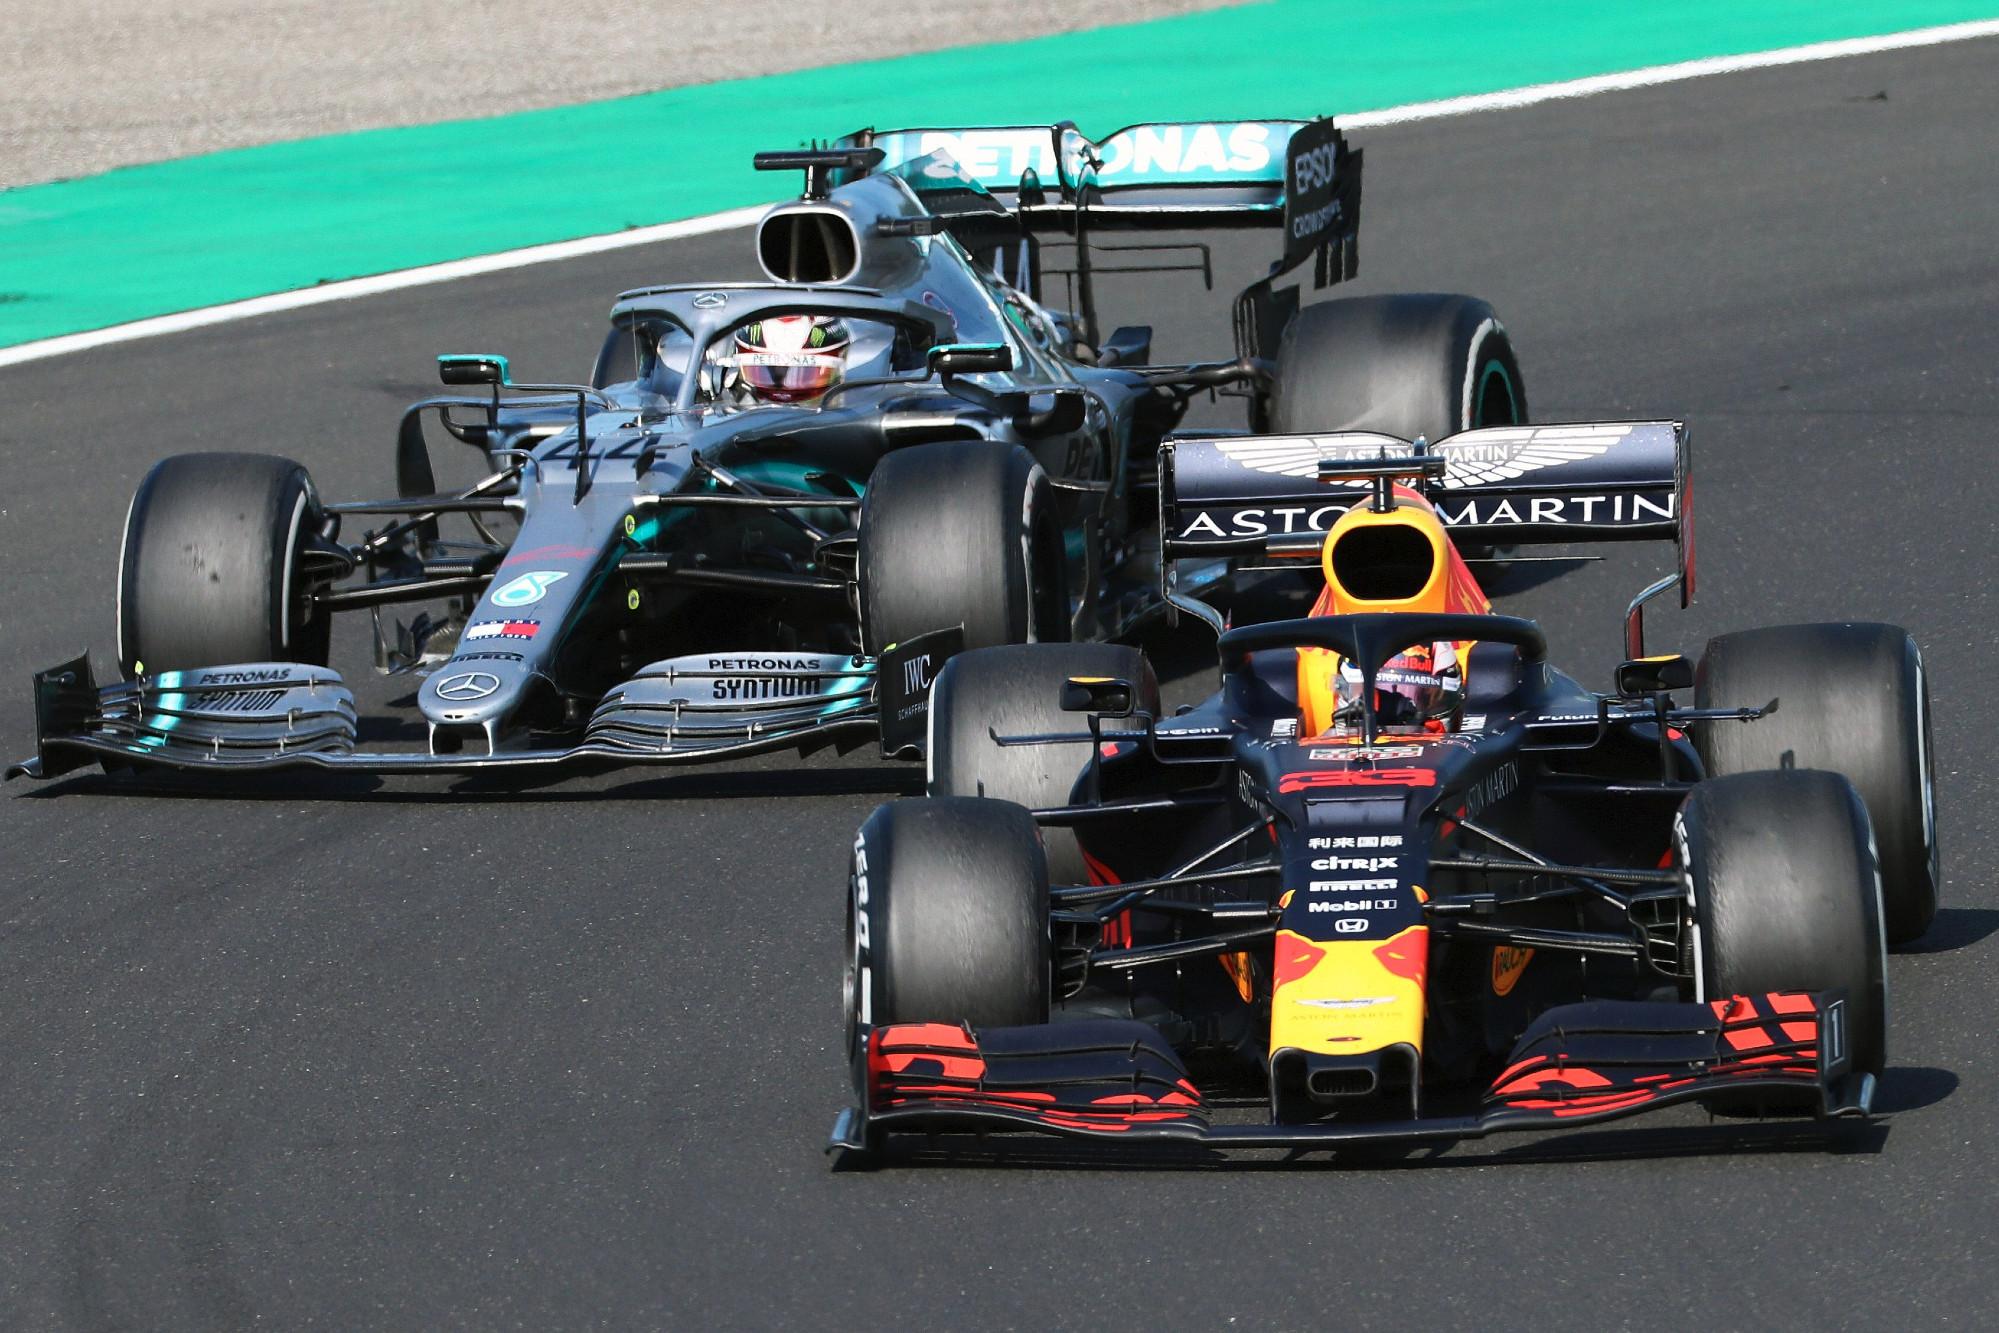 2019 Hungarian GP, Hamilton and Verstappen